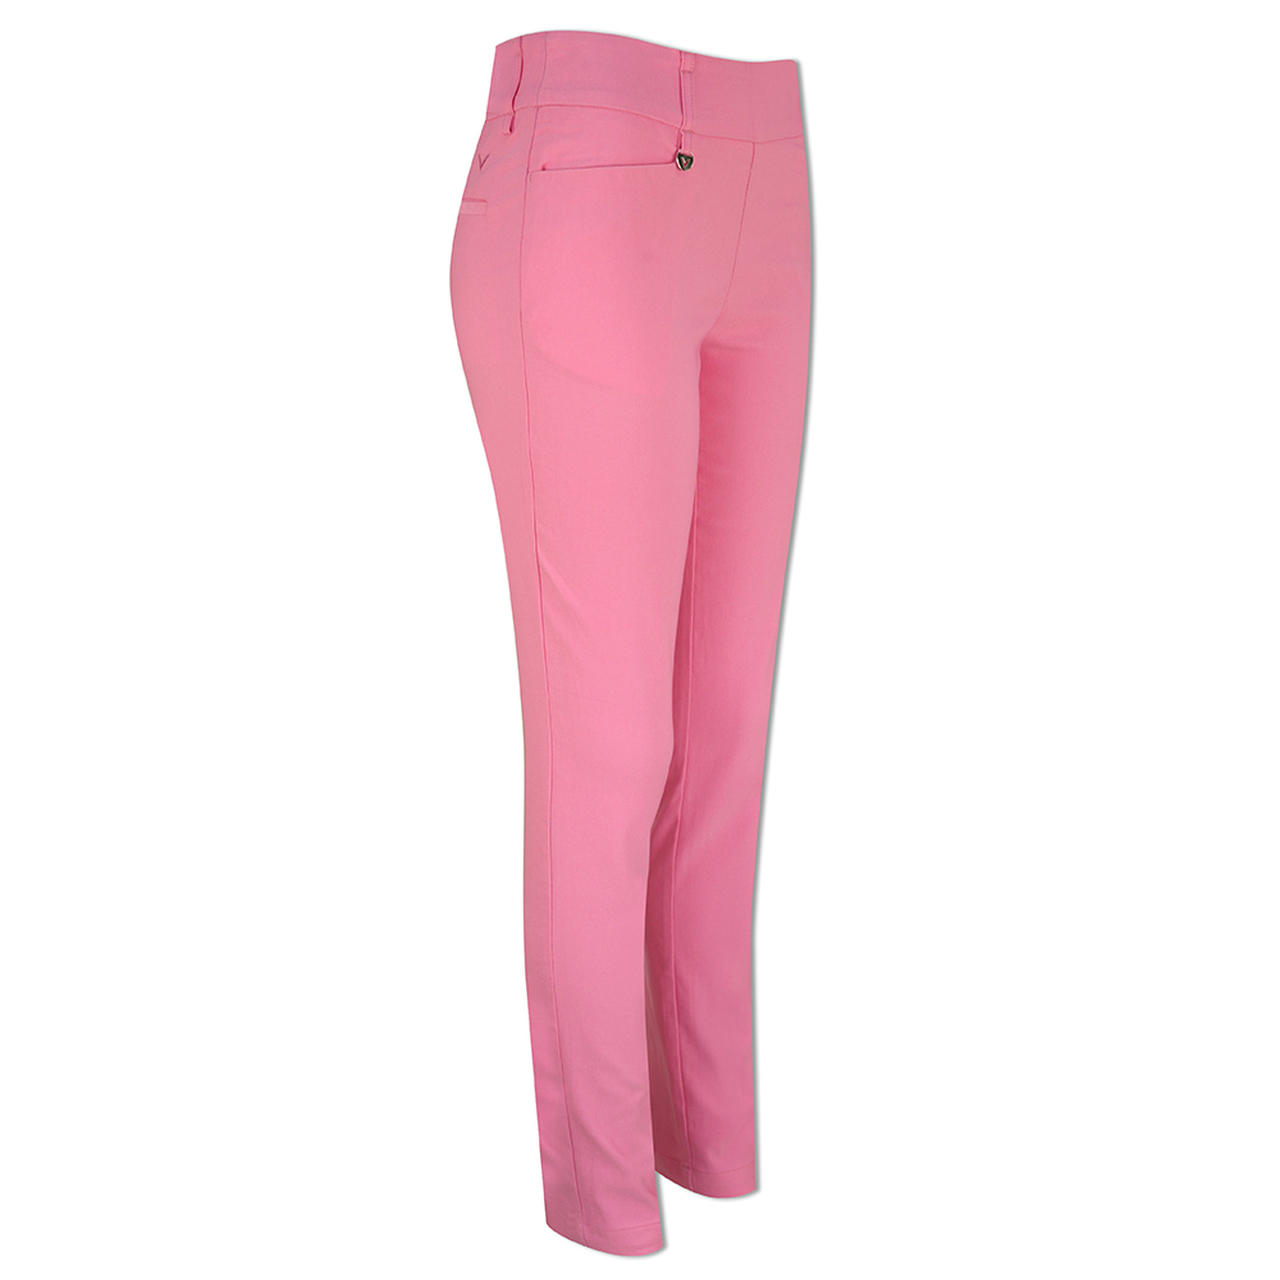 Callaway dámské golfové kalhoty růžové 34/29